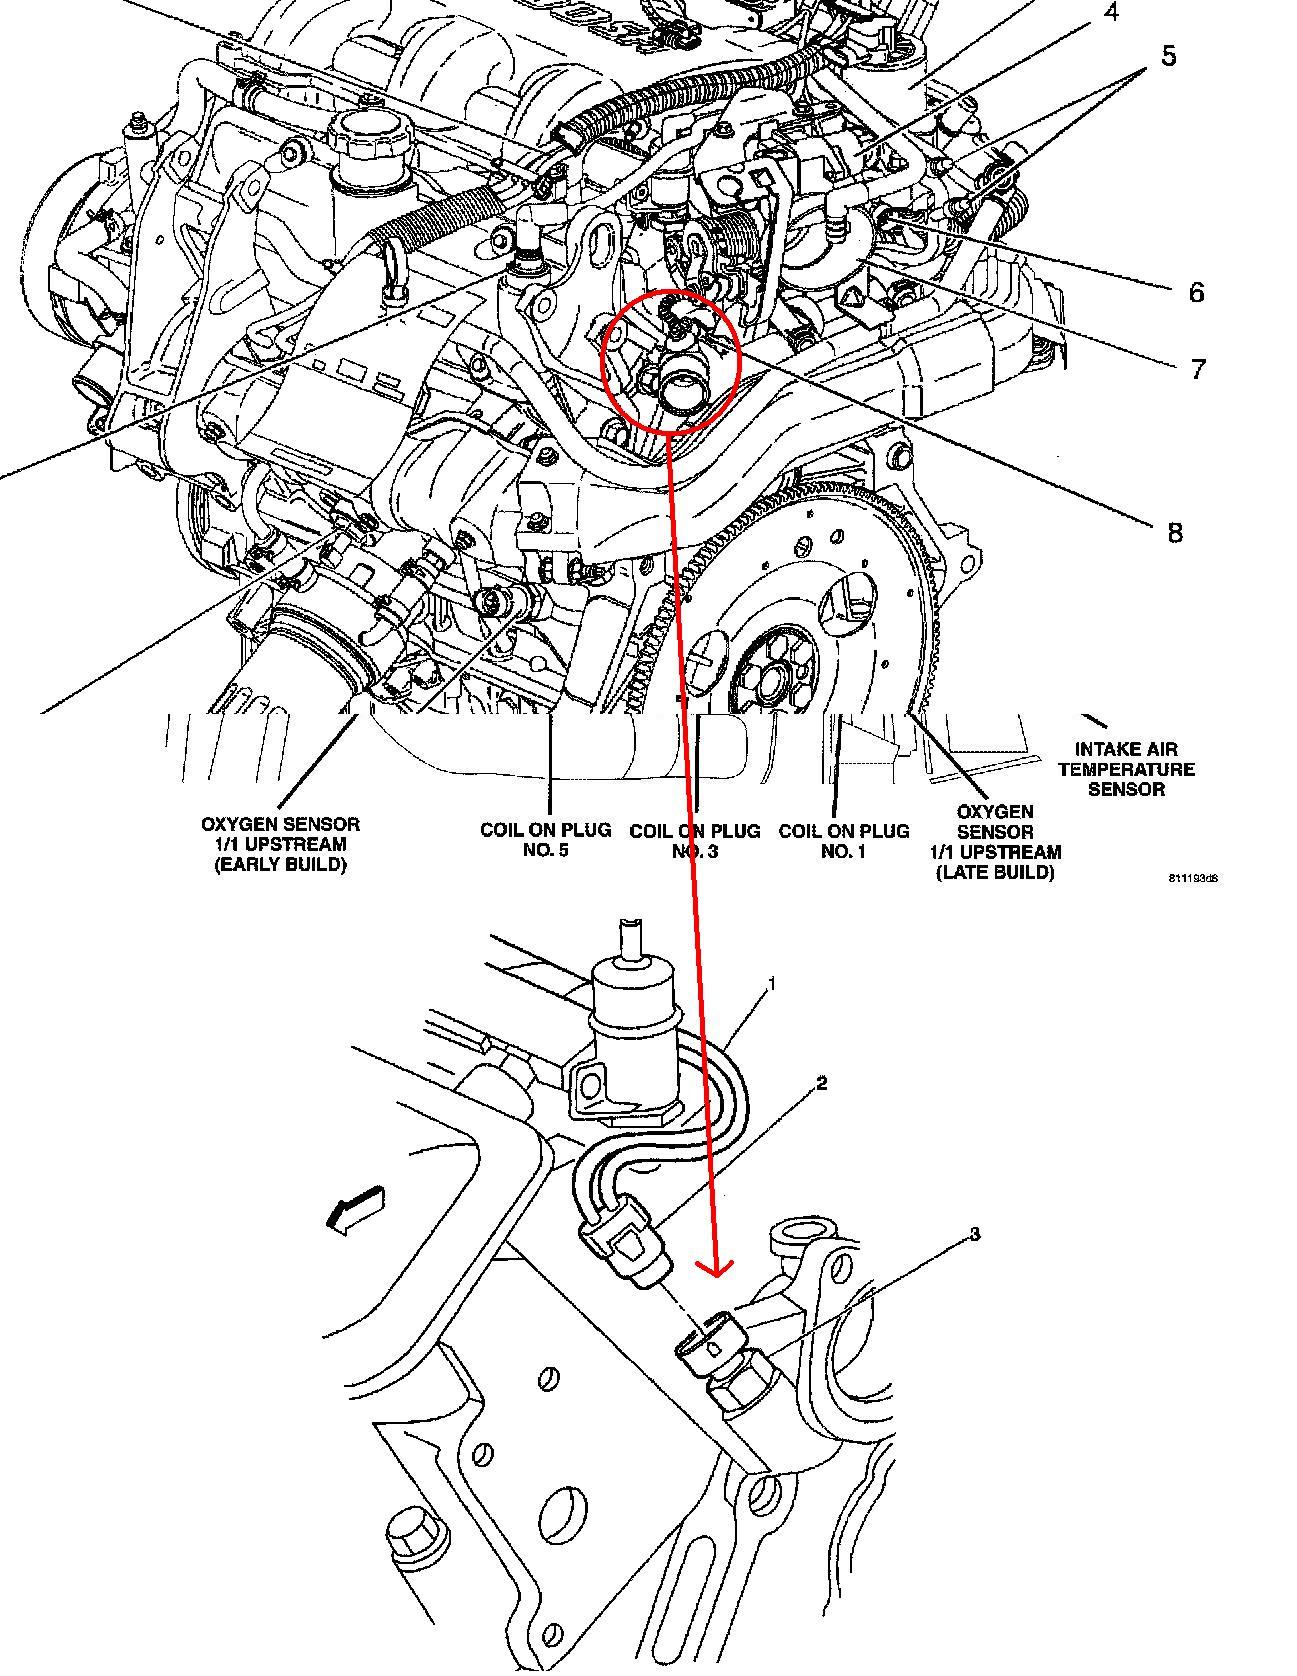 2007 Pontiac G6 Wiring Diagram